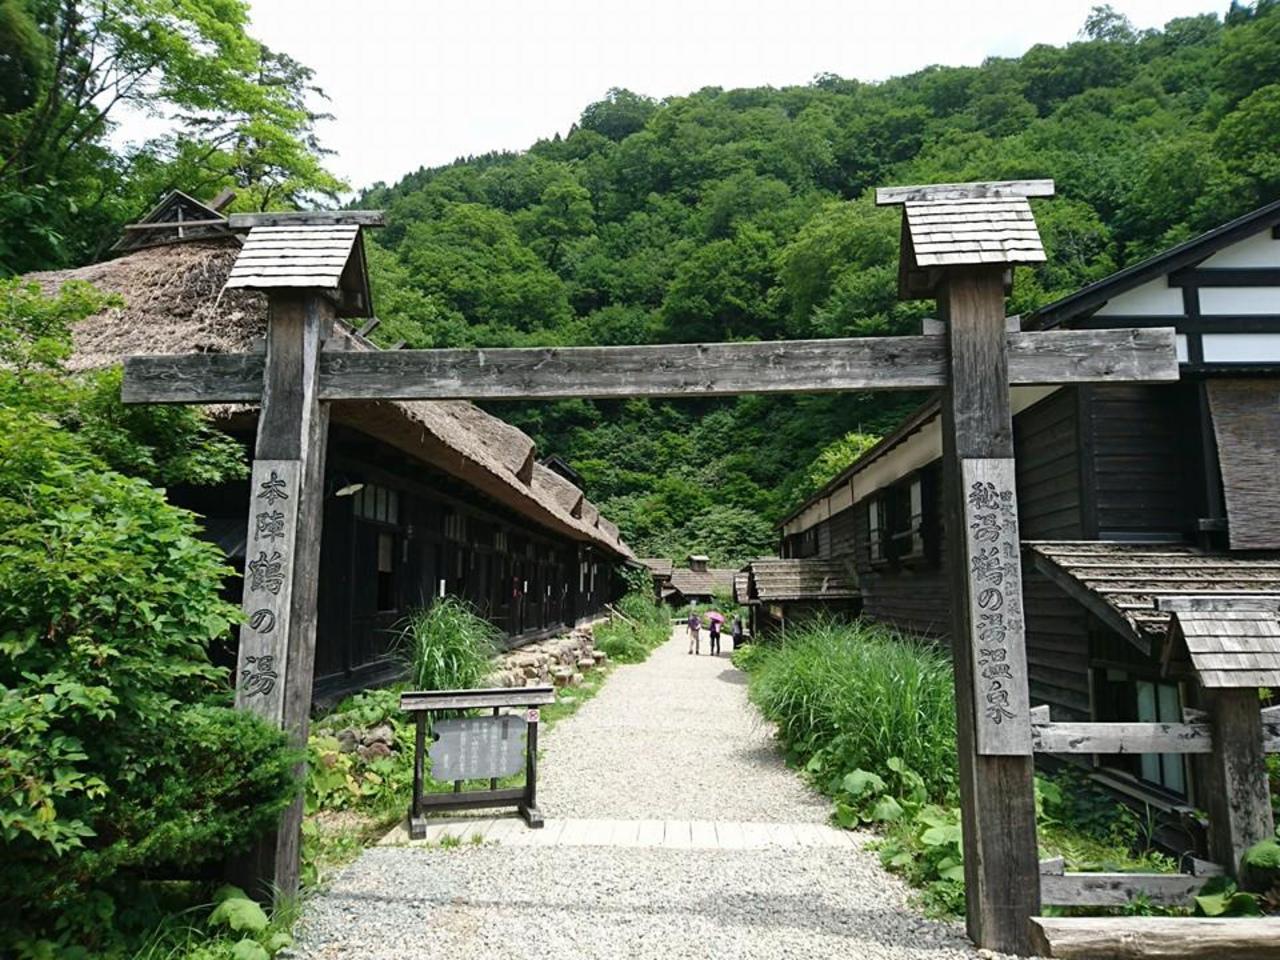 秋田県仙北市の『乳頭温泉郷』